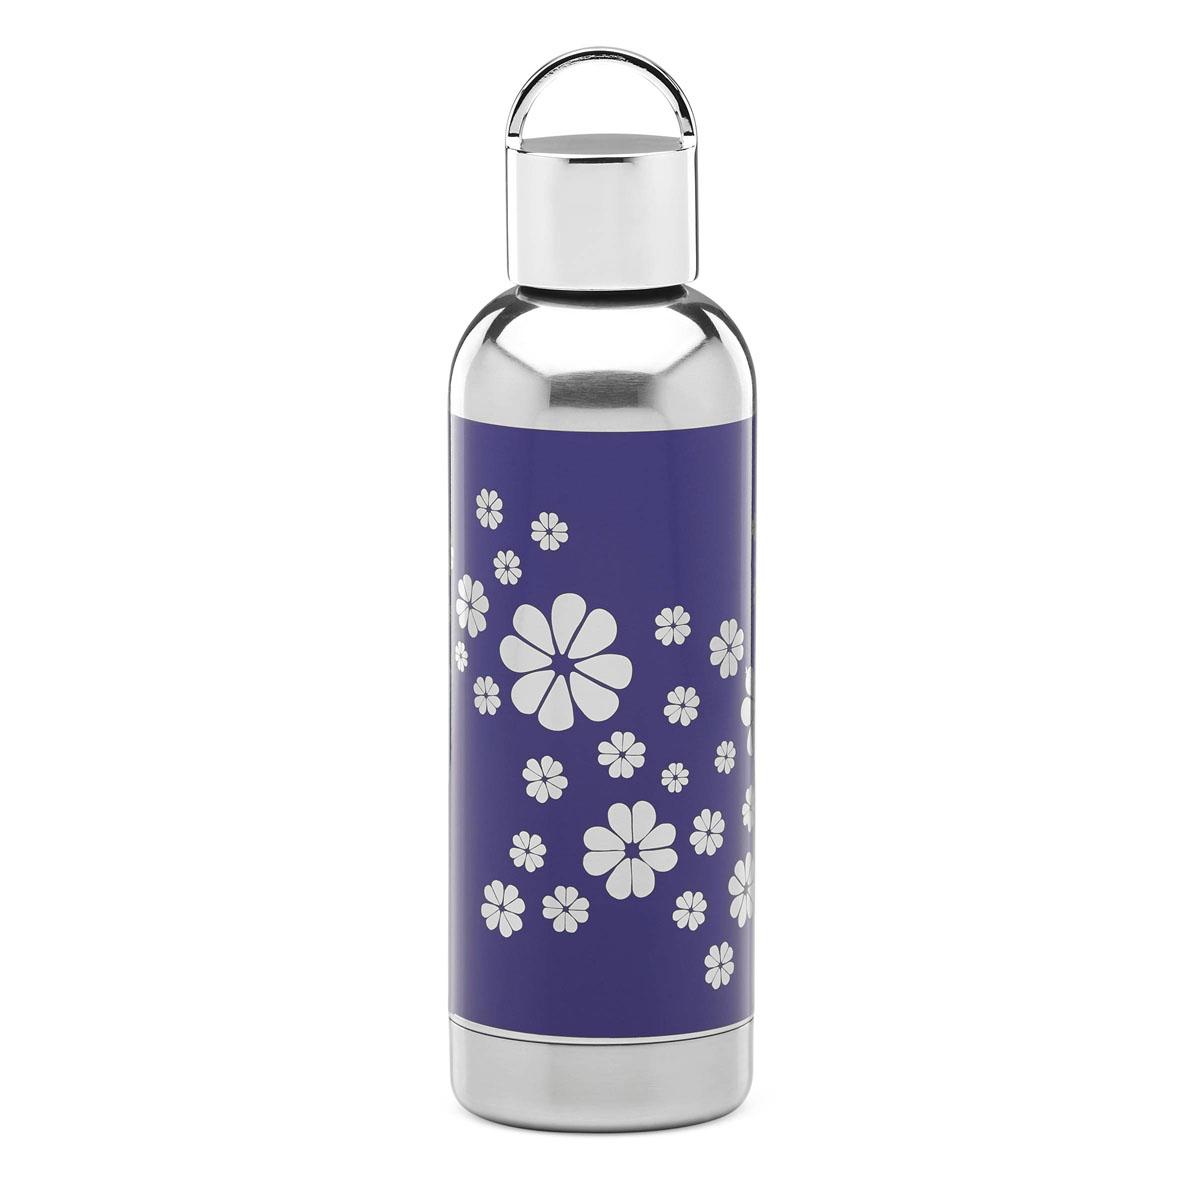 kate spade new york Lenox Nolita Blue Navy Spade Flower 17oz Hydration